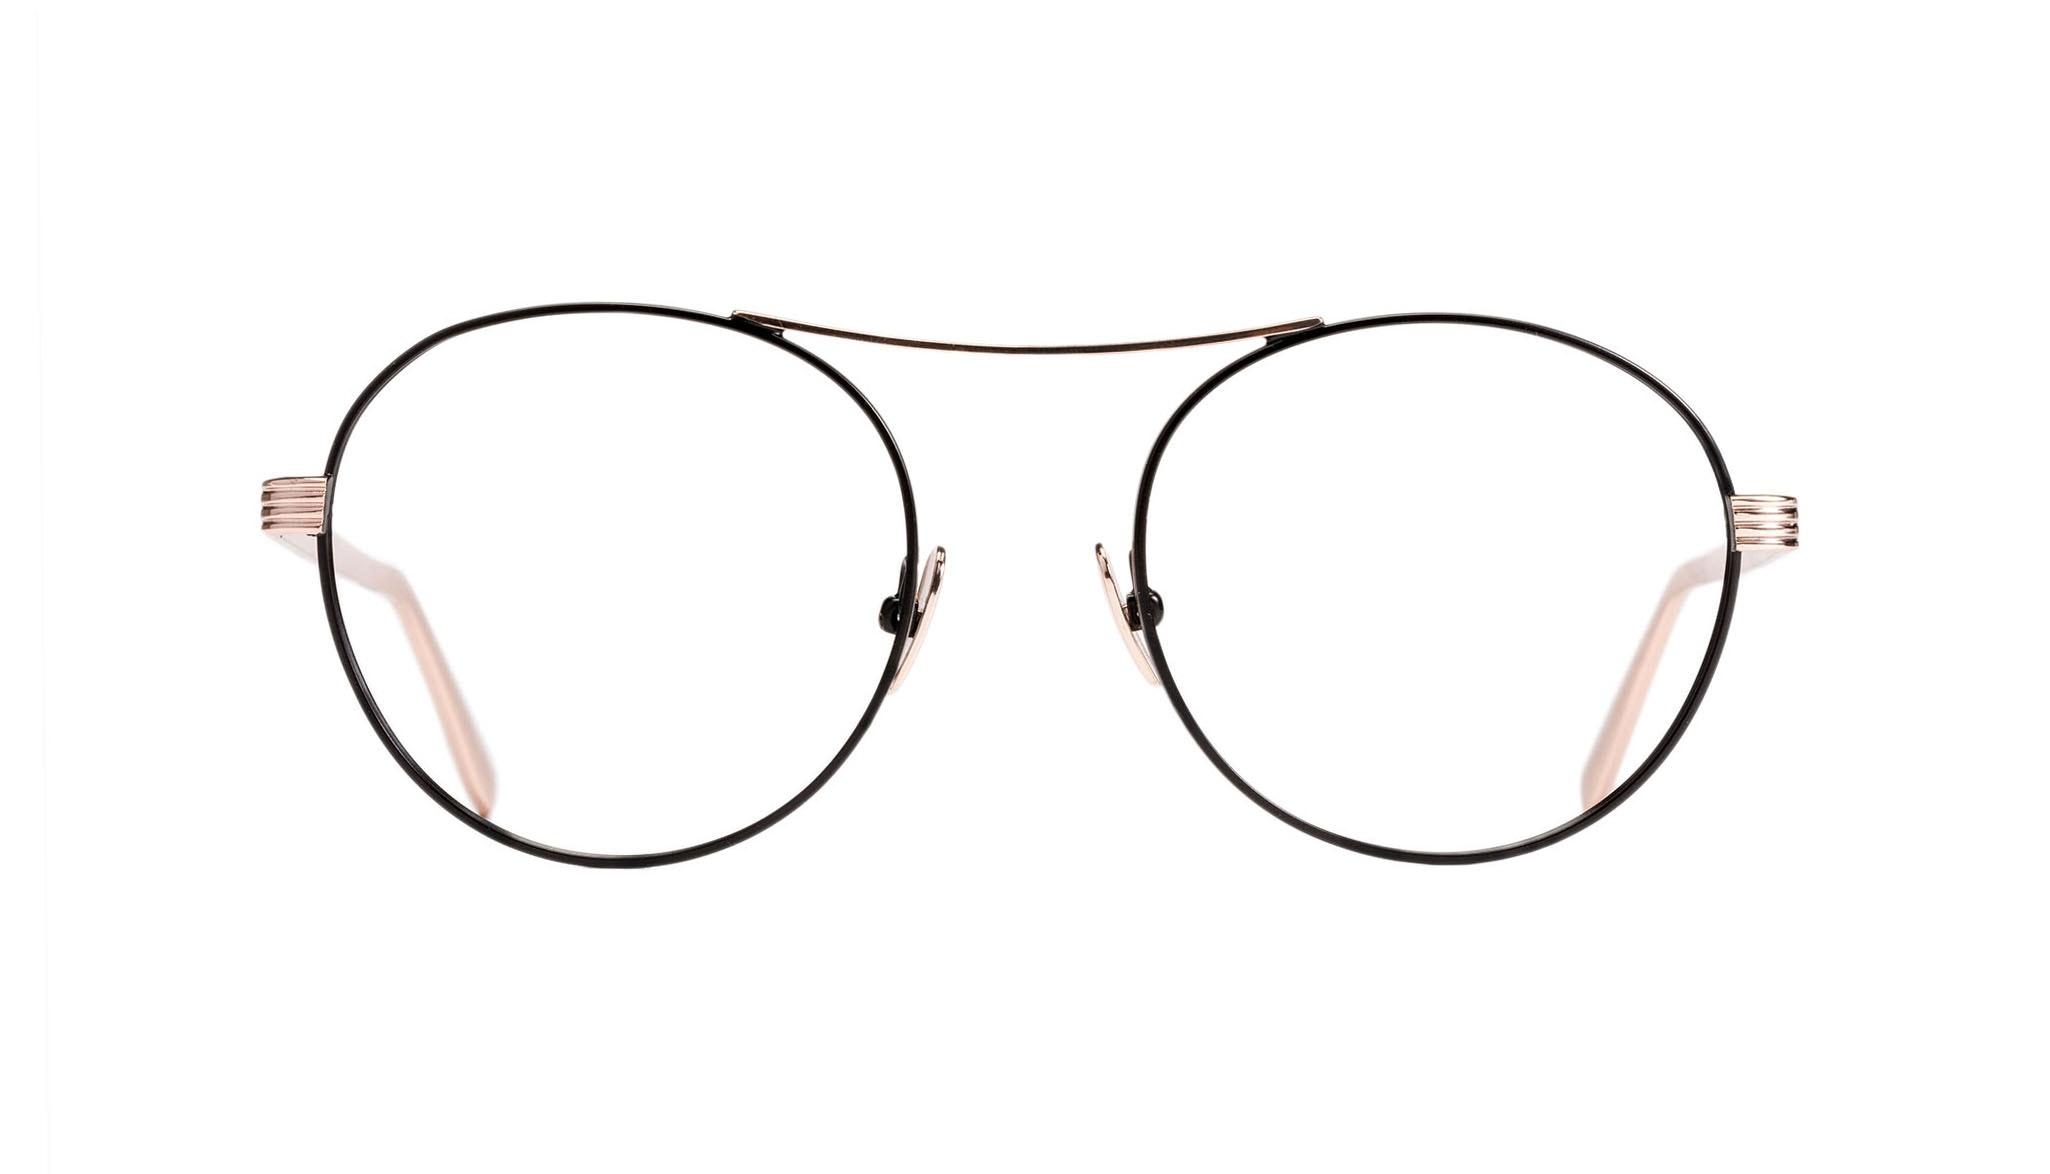 Affordable Fashion Glasses Round Eyeglasses Women Prize Deep Gold